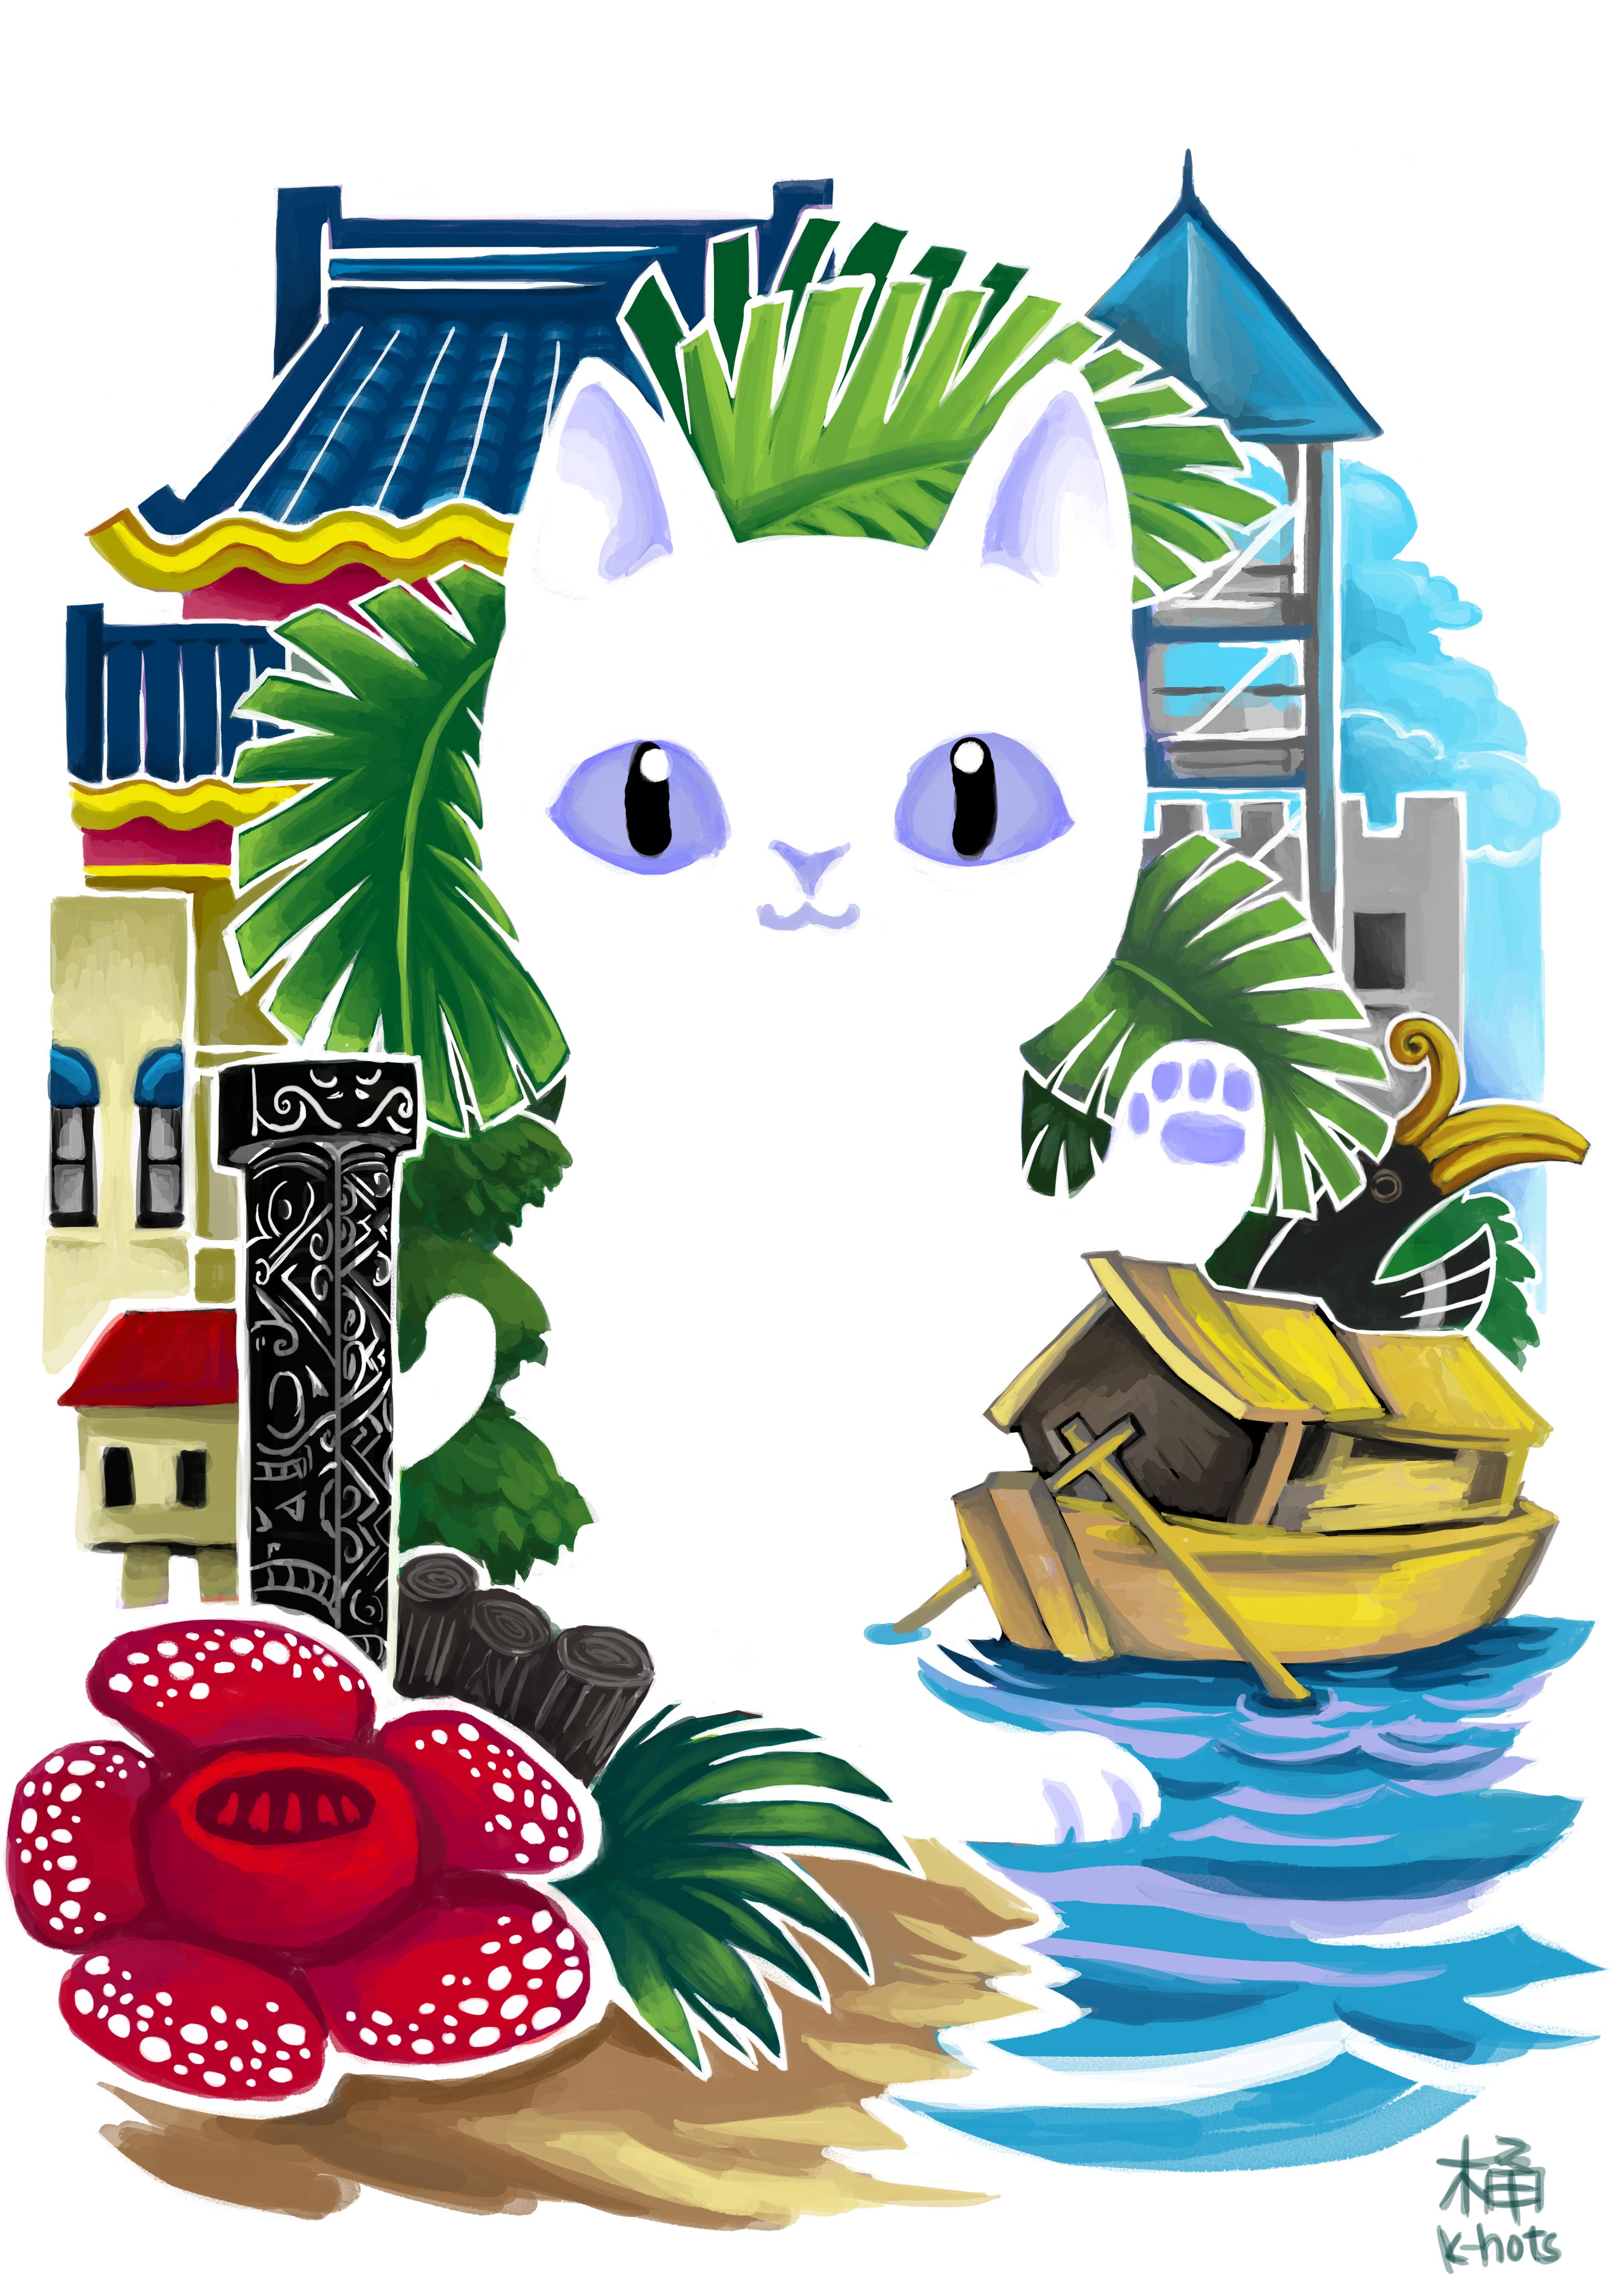 Kuching white cat by k hots on deviantart for Home wallpaper kuching